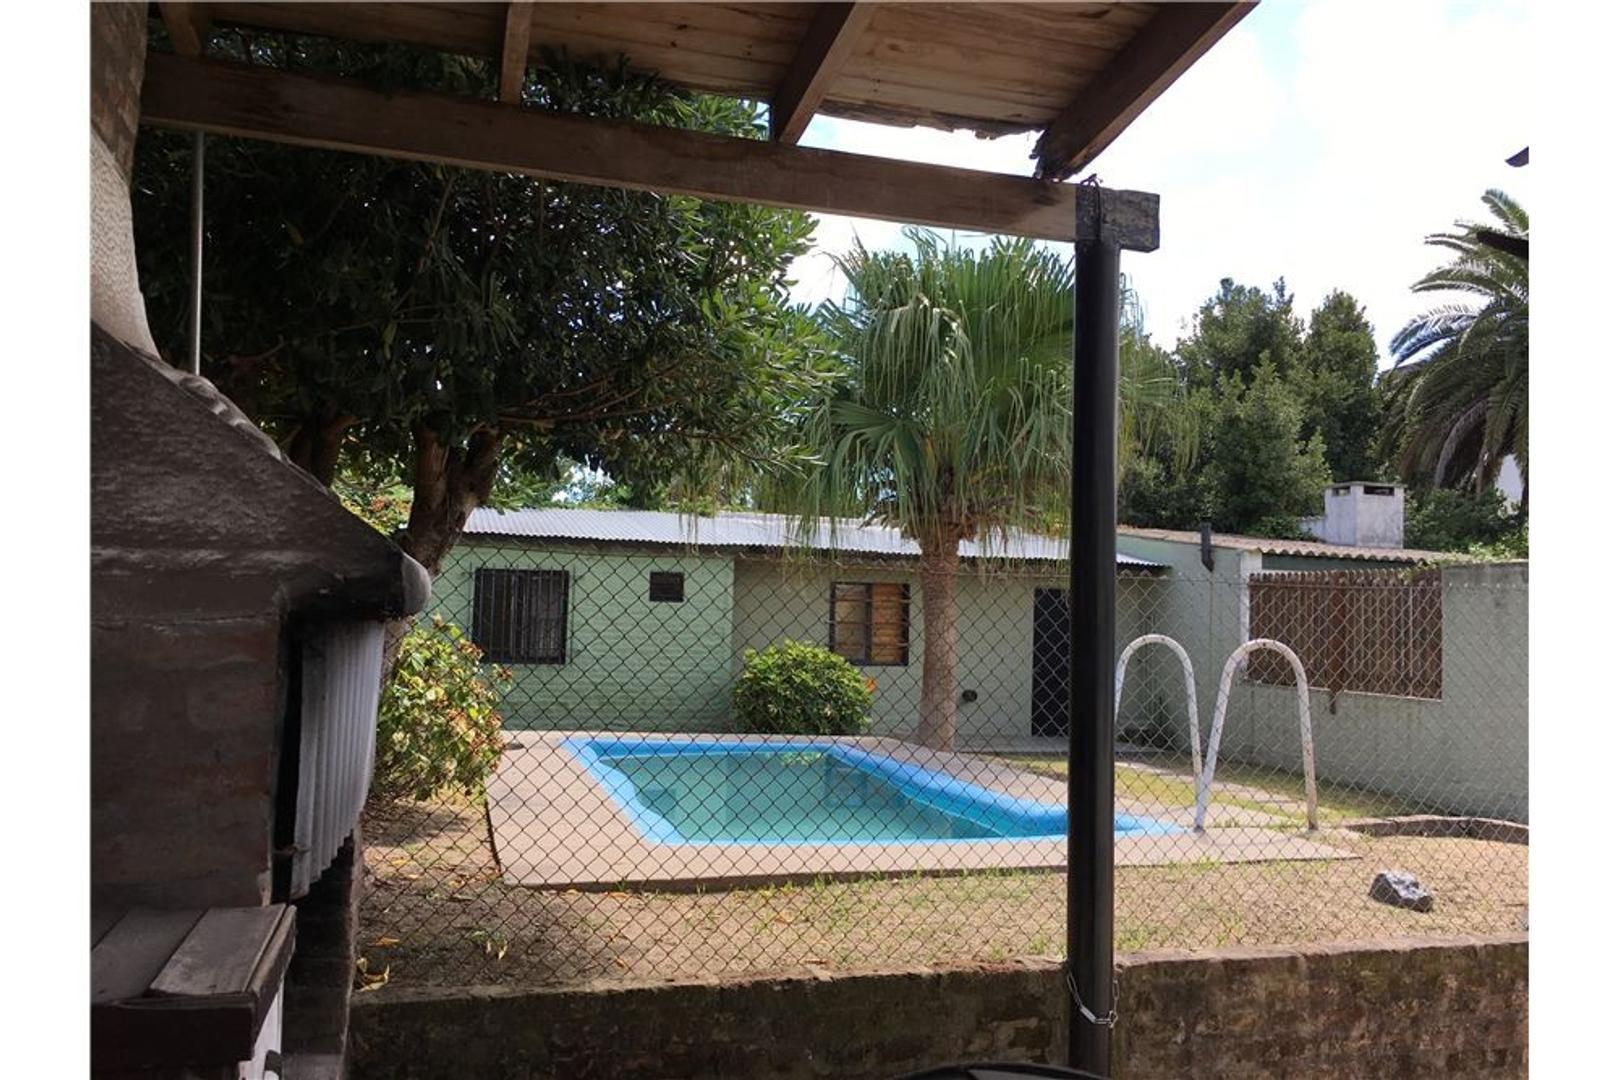 Casa en venta Gonnet, La Plata